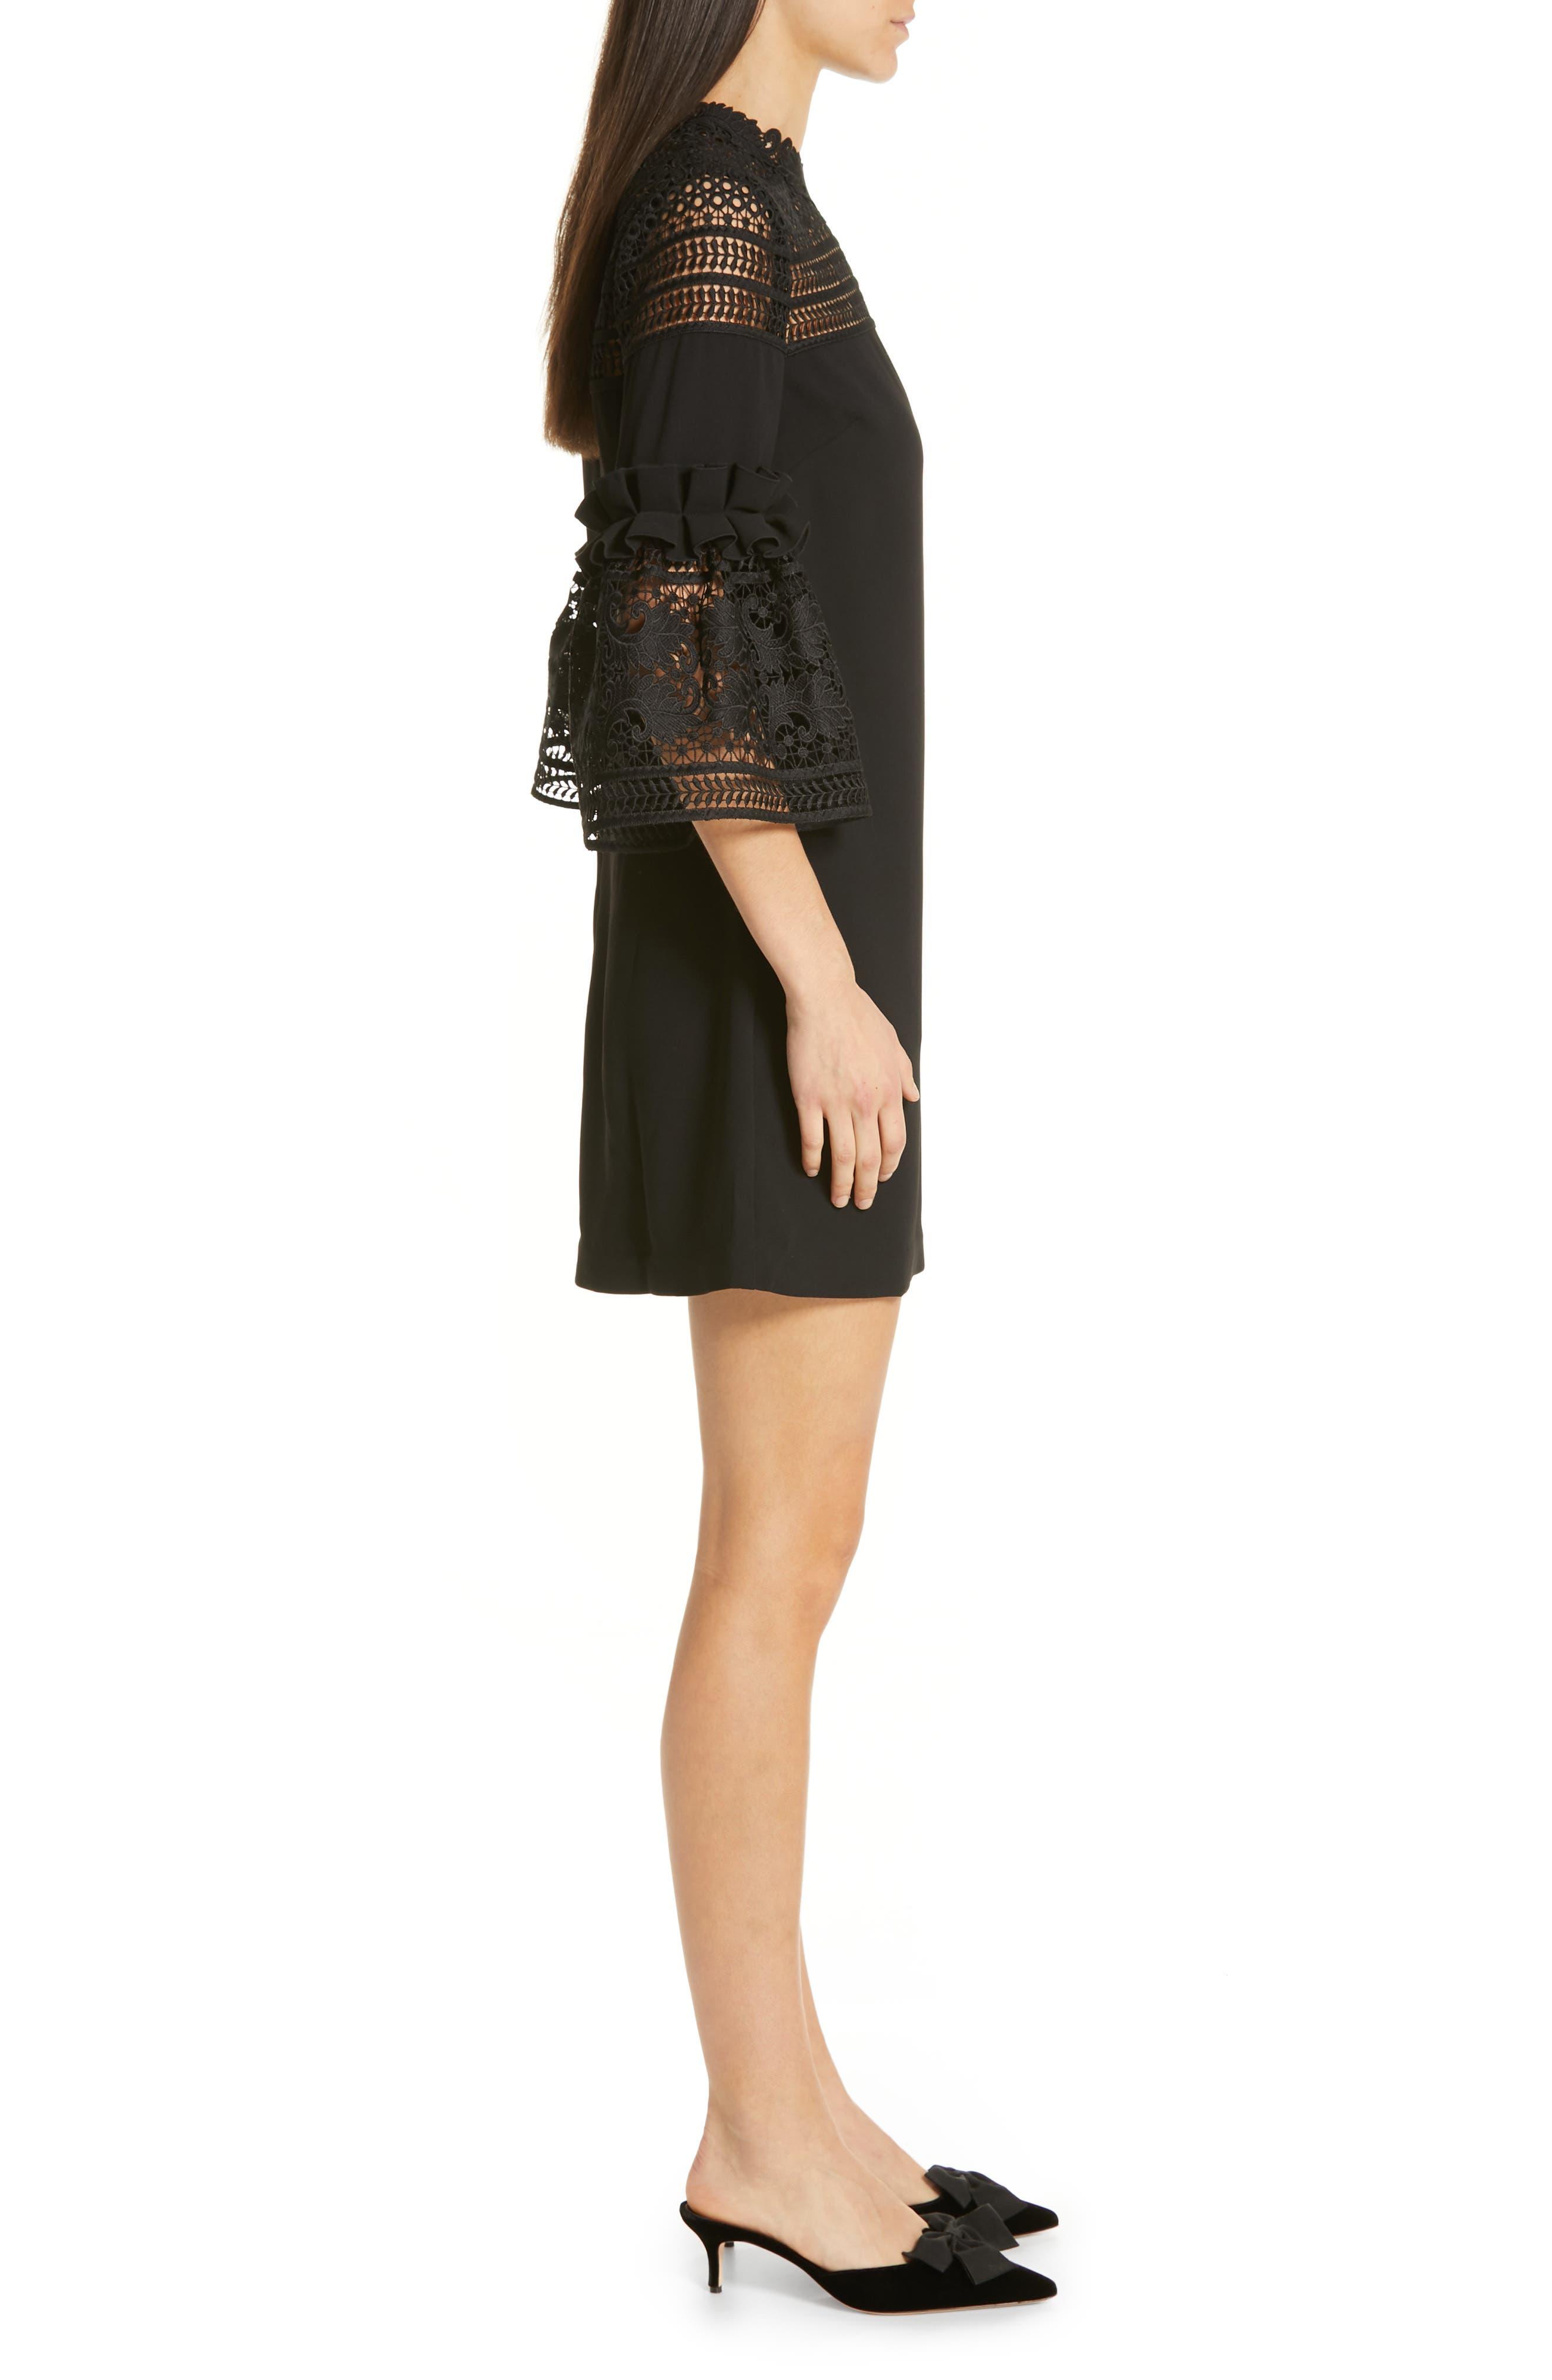 TED BAKER LONDON, Lace Panel Bell Sleeve Tunic Dress, Alternate thumbnail 4, color, BLACK